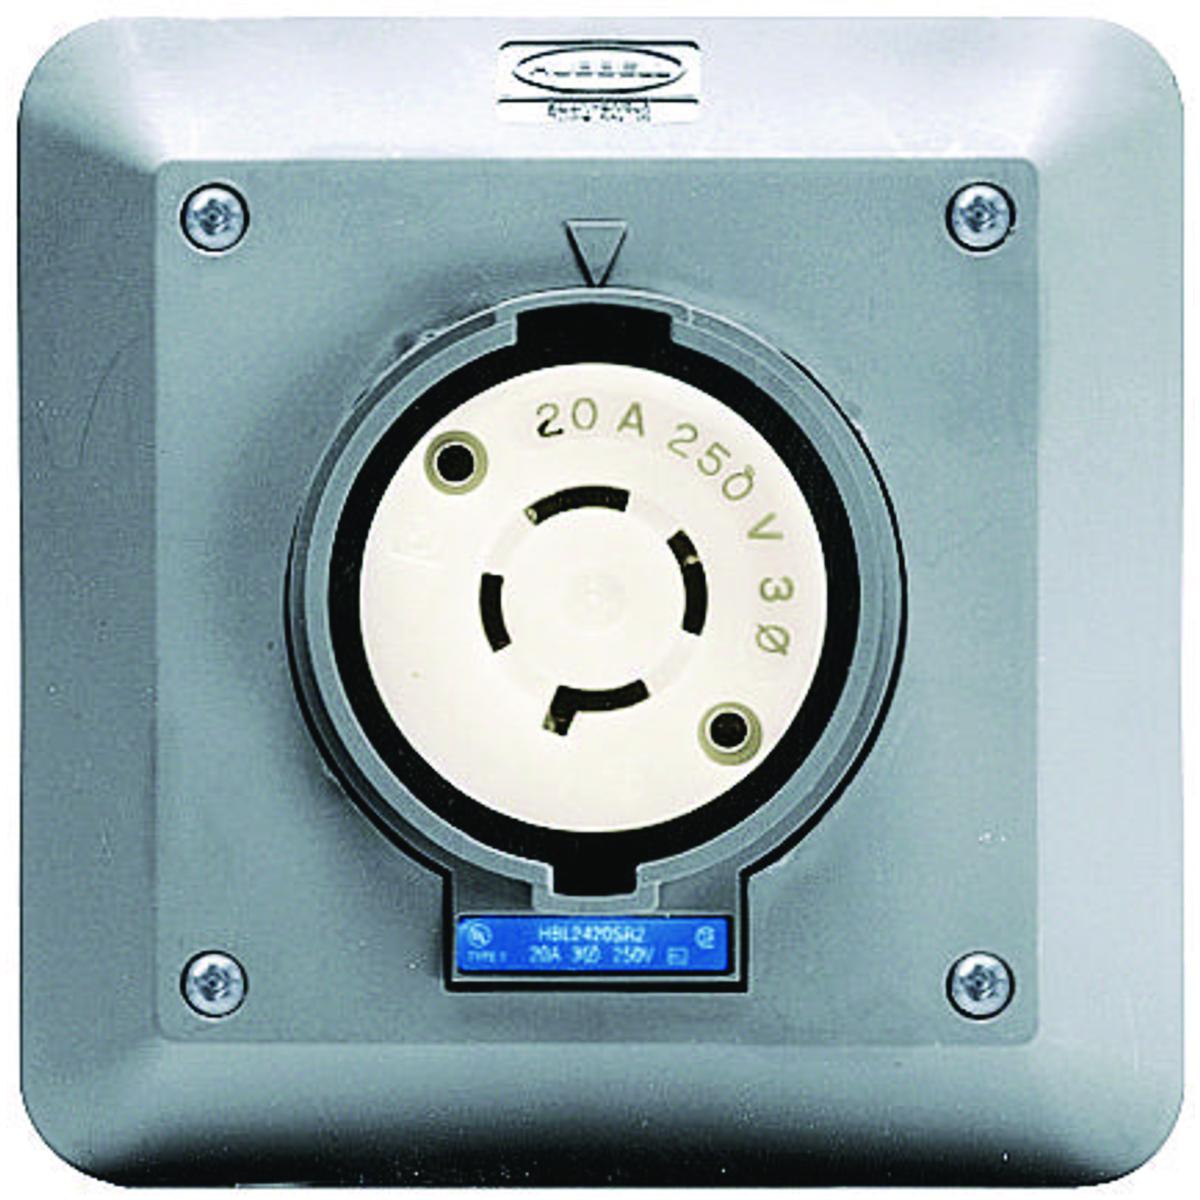 HBL2420SR2 | Brand | Wiring Device - Kellems